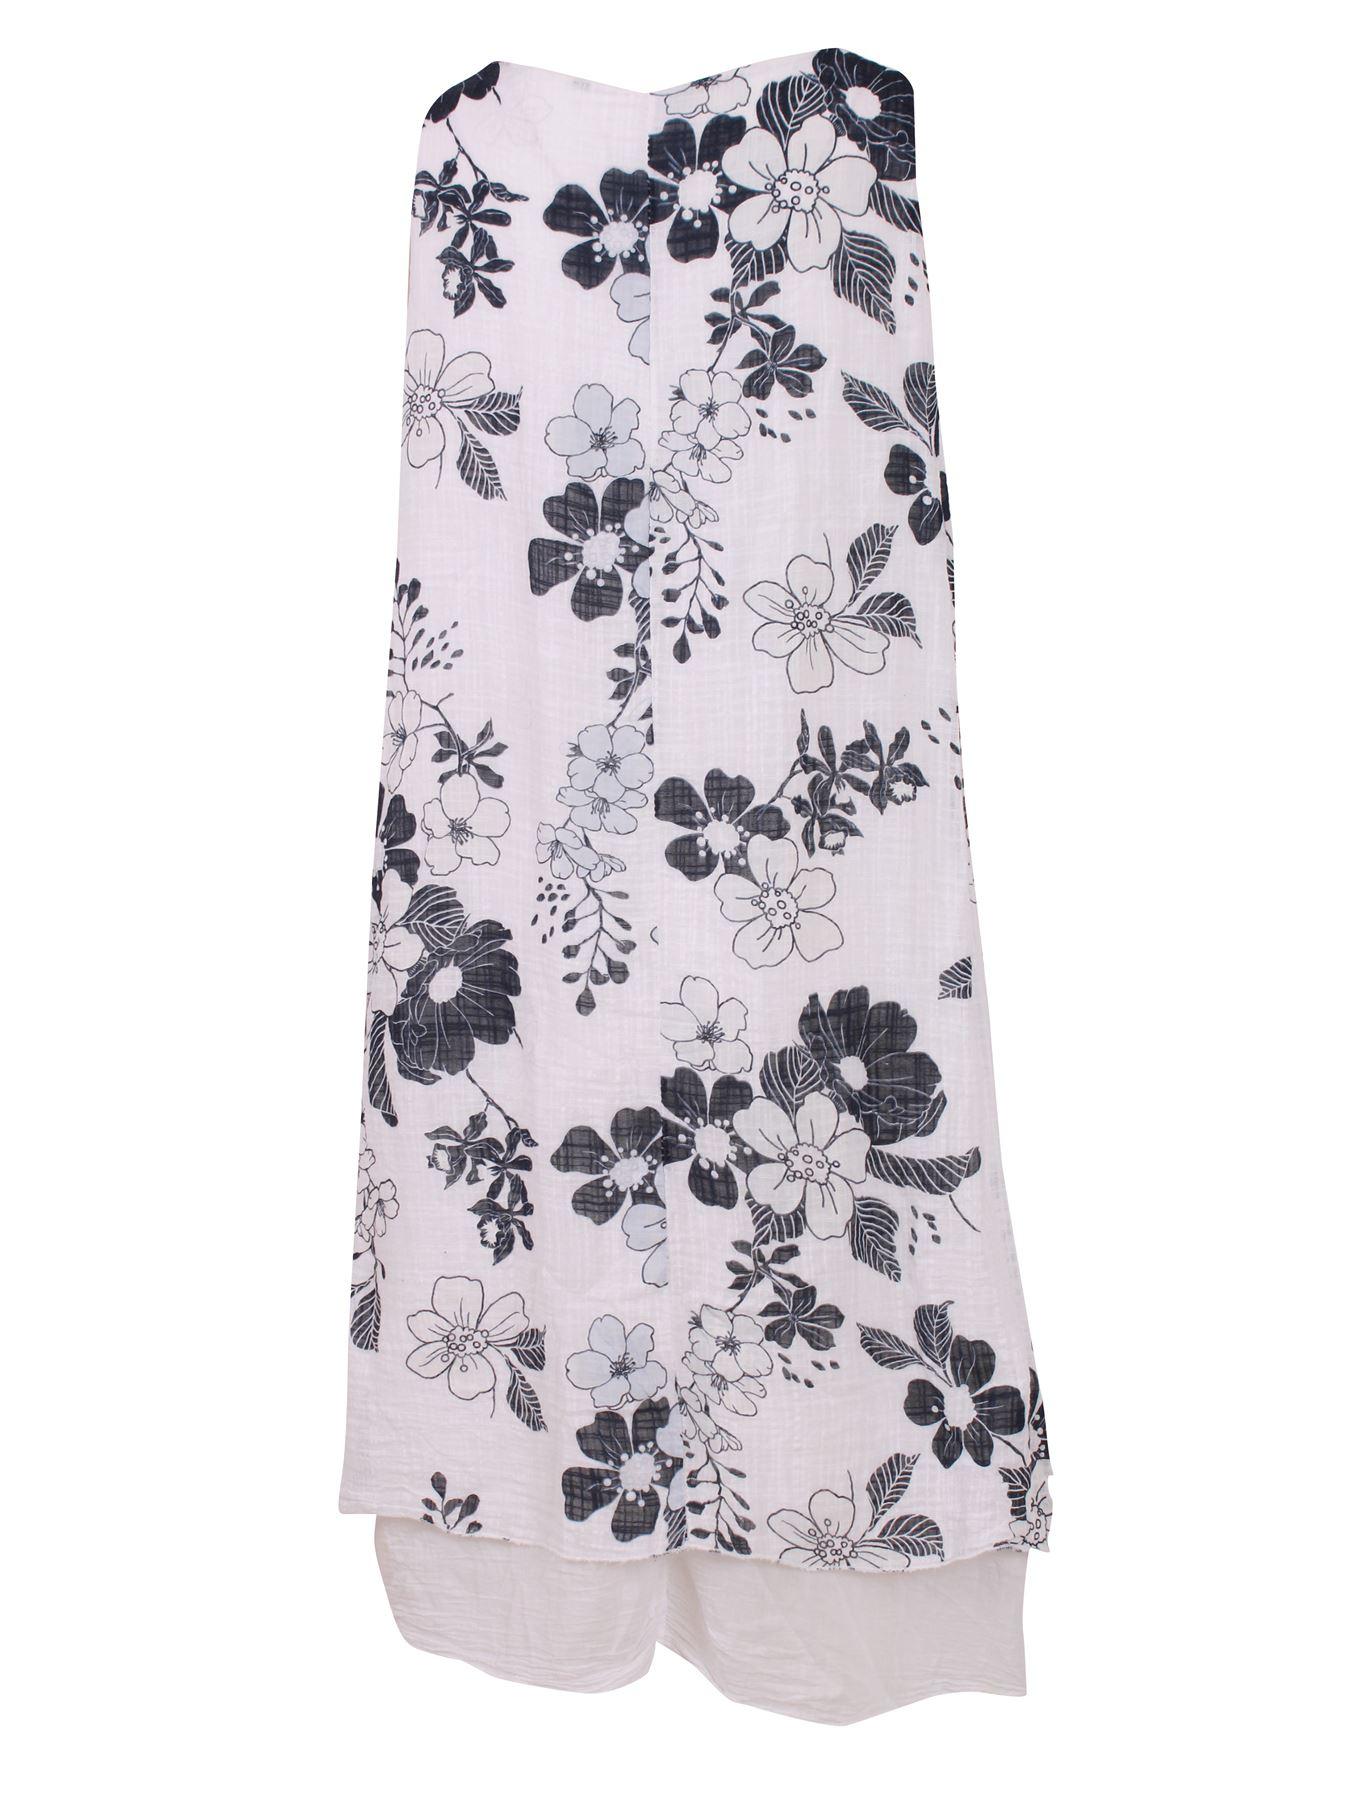 Womens-Floral-Print-Italian-Fashion-Lagenlook-Summer-Cotton-Crew-Neck-Dress thumbnail 30